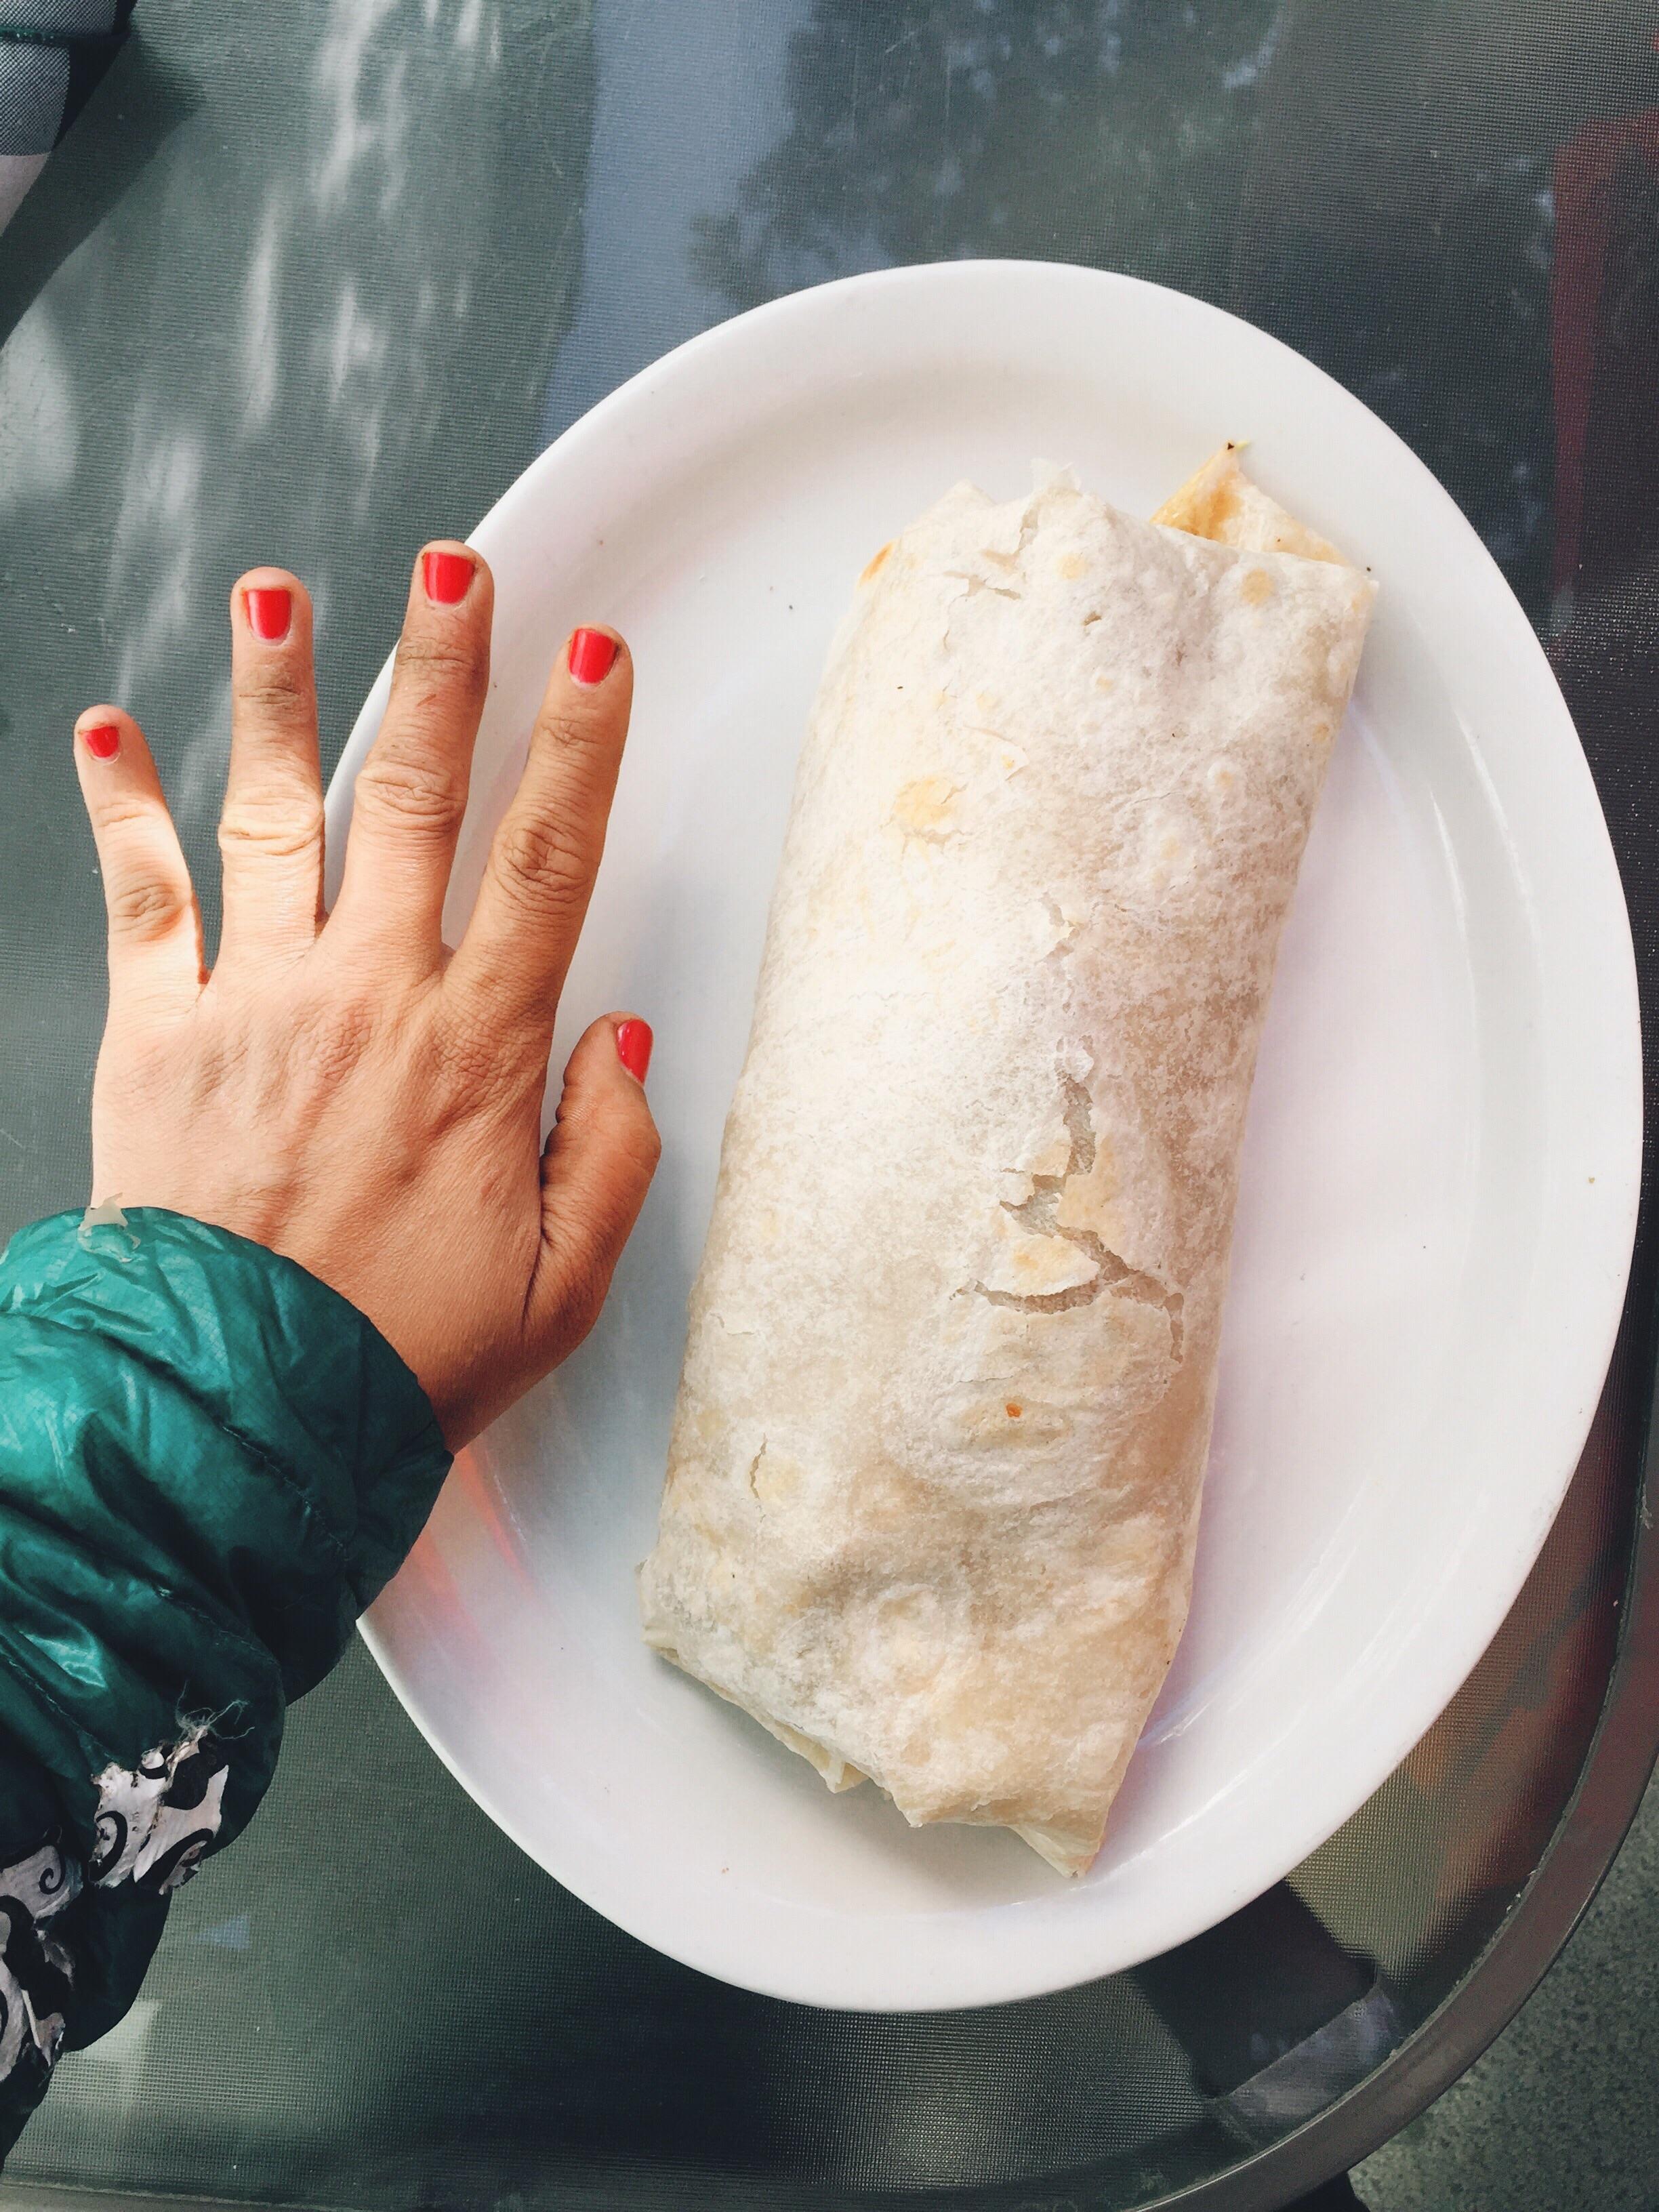 Burrito bigger than my hand.